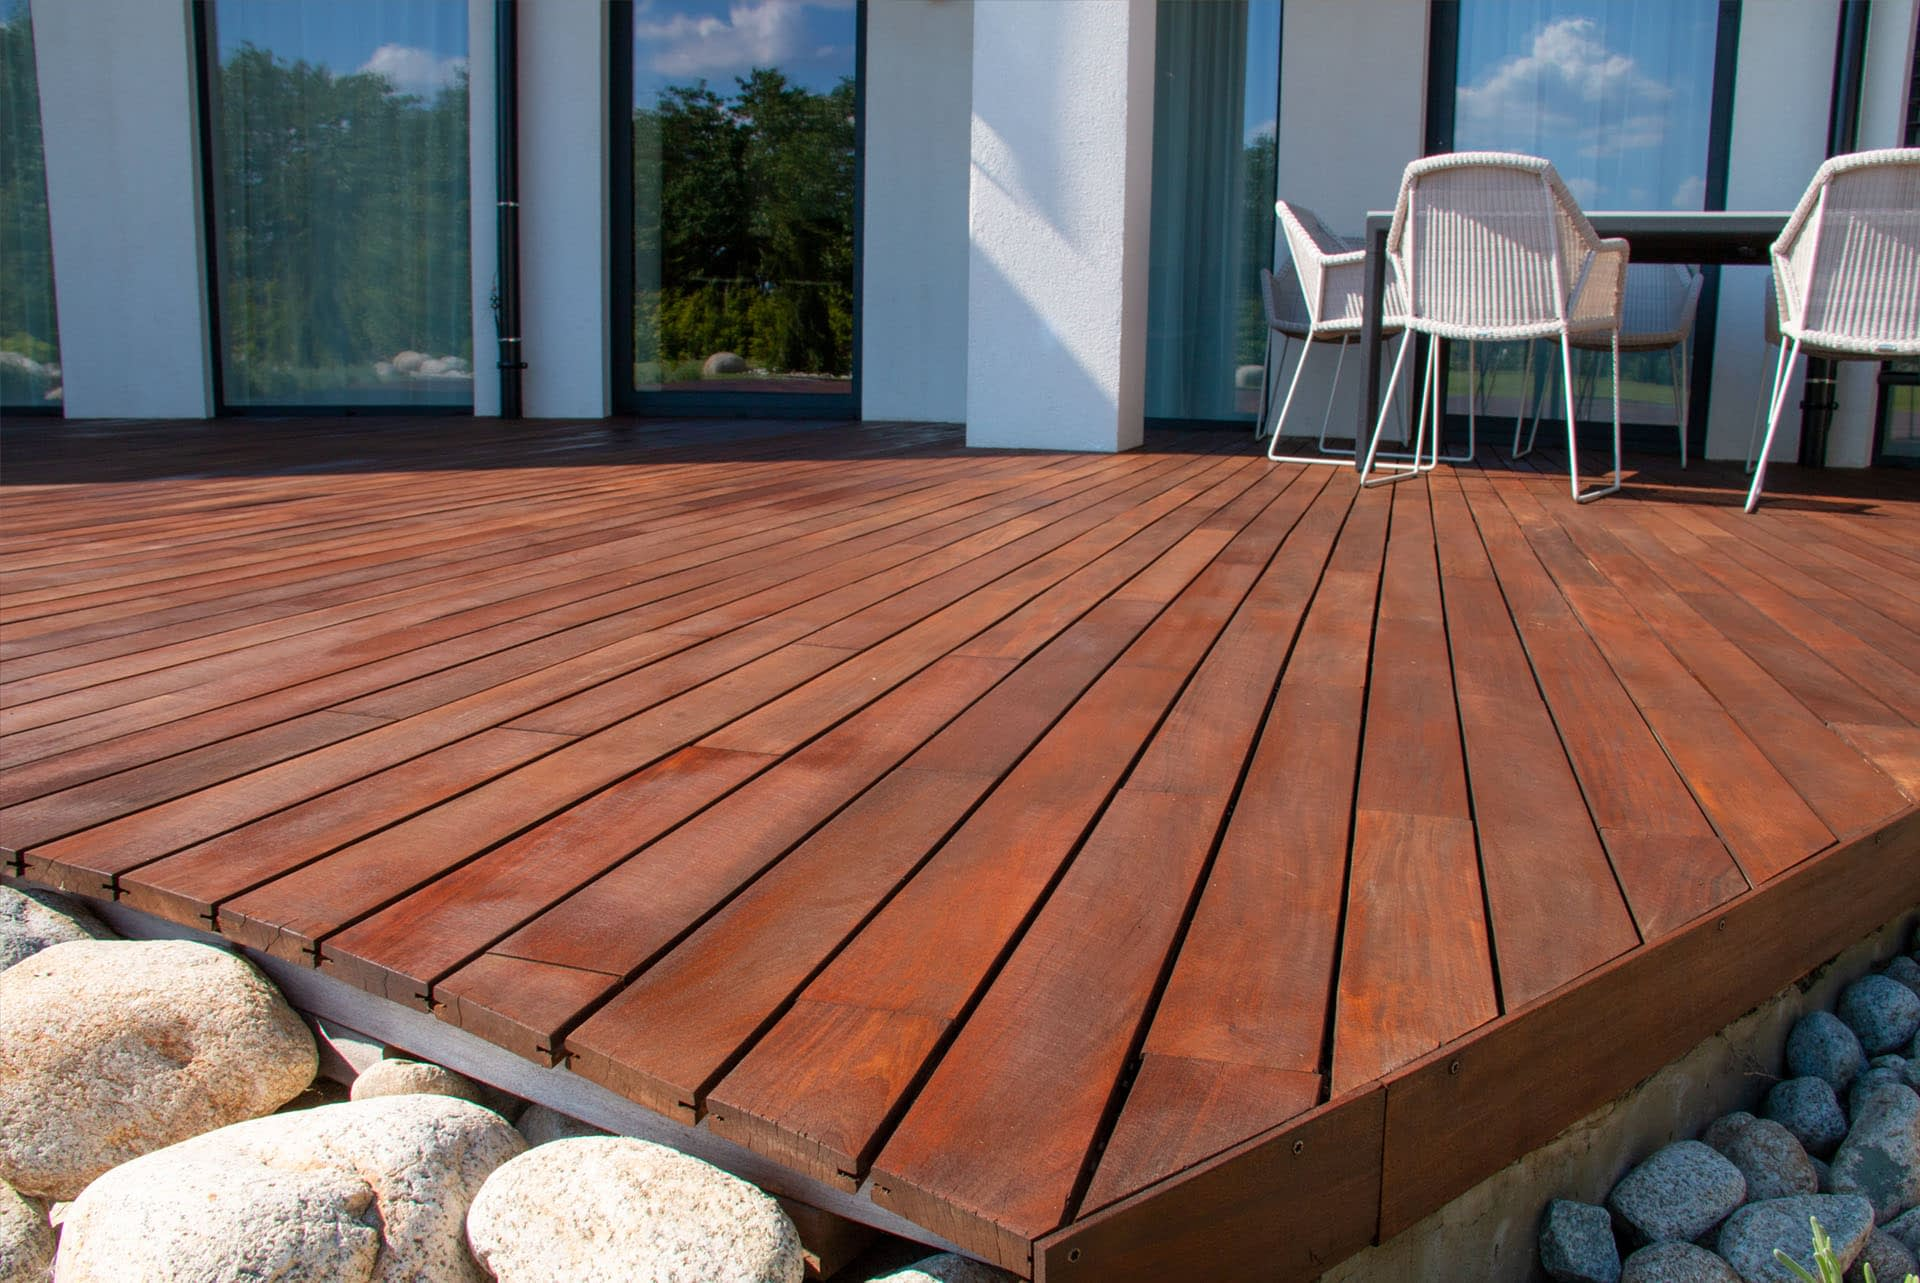 Timber Decking wooden deck boards hardwood pressure treated smooth dark wood patio